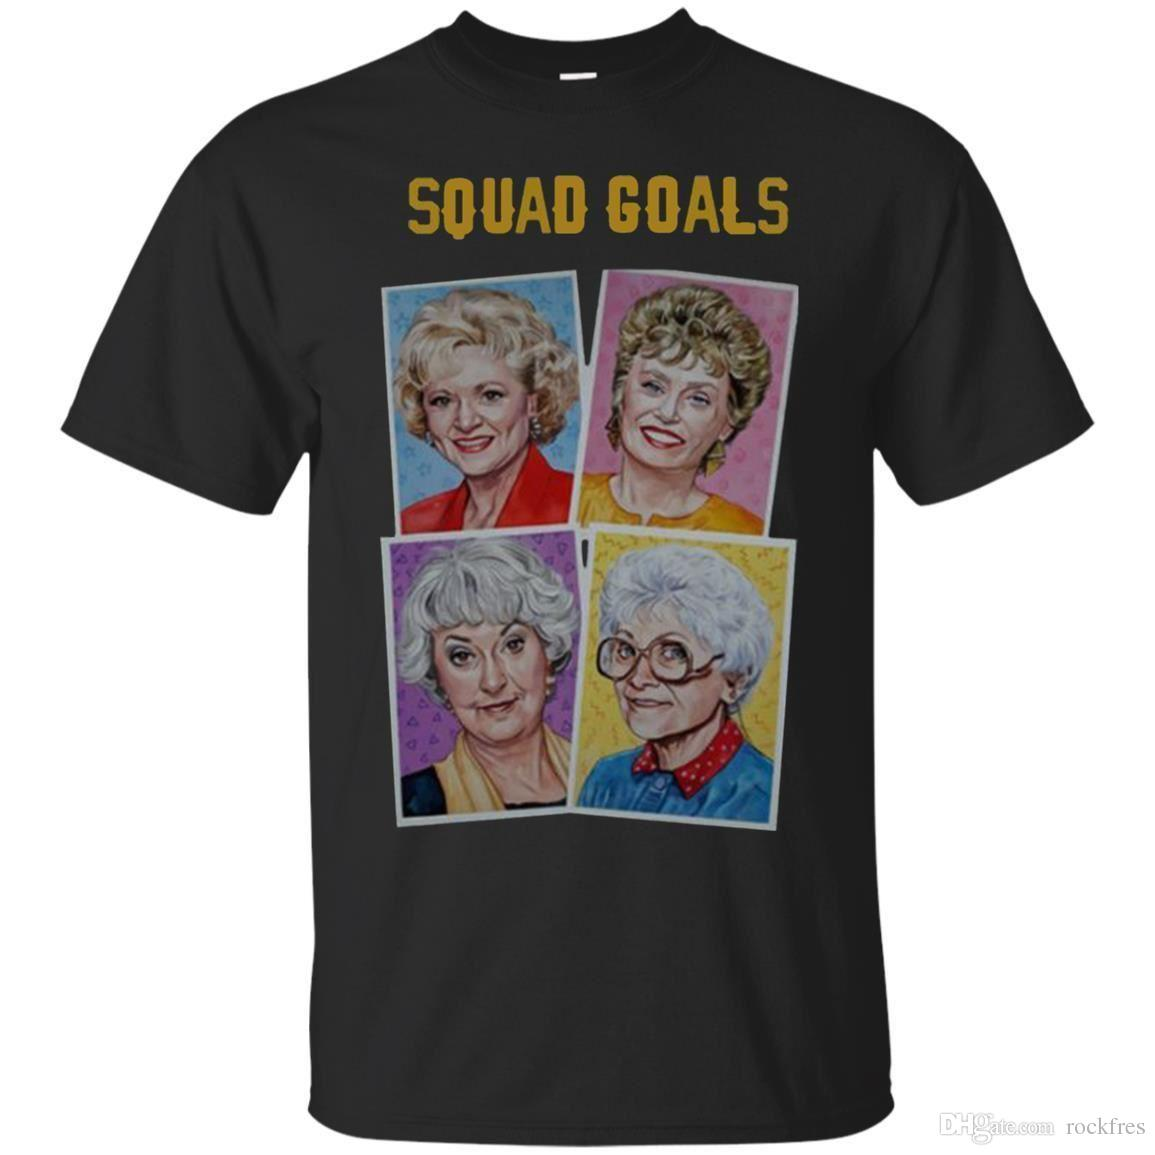 481dd0e24 Squad Goals The Golden Girls T Shirt Rose Dorothy Blanche TV Show Shirts S  3XL Shirts Designer Designer White T Shirts From Rockfres, $10.19|  DHgate.Com